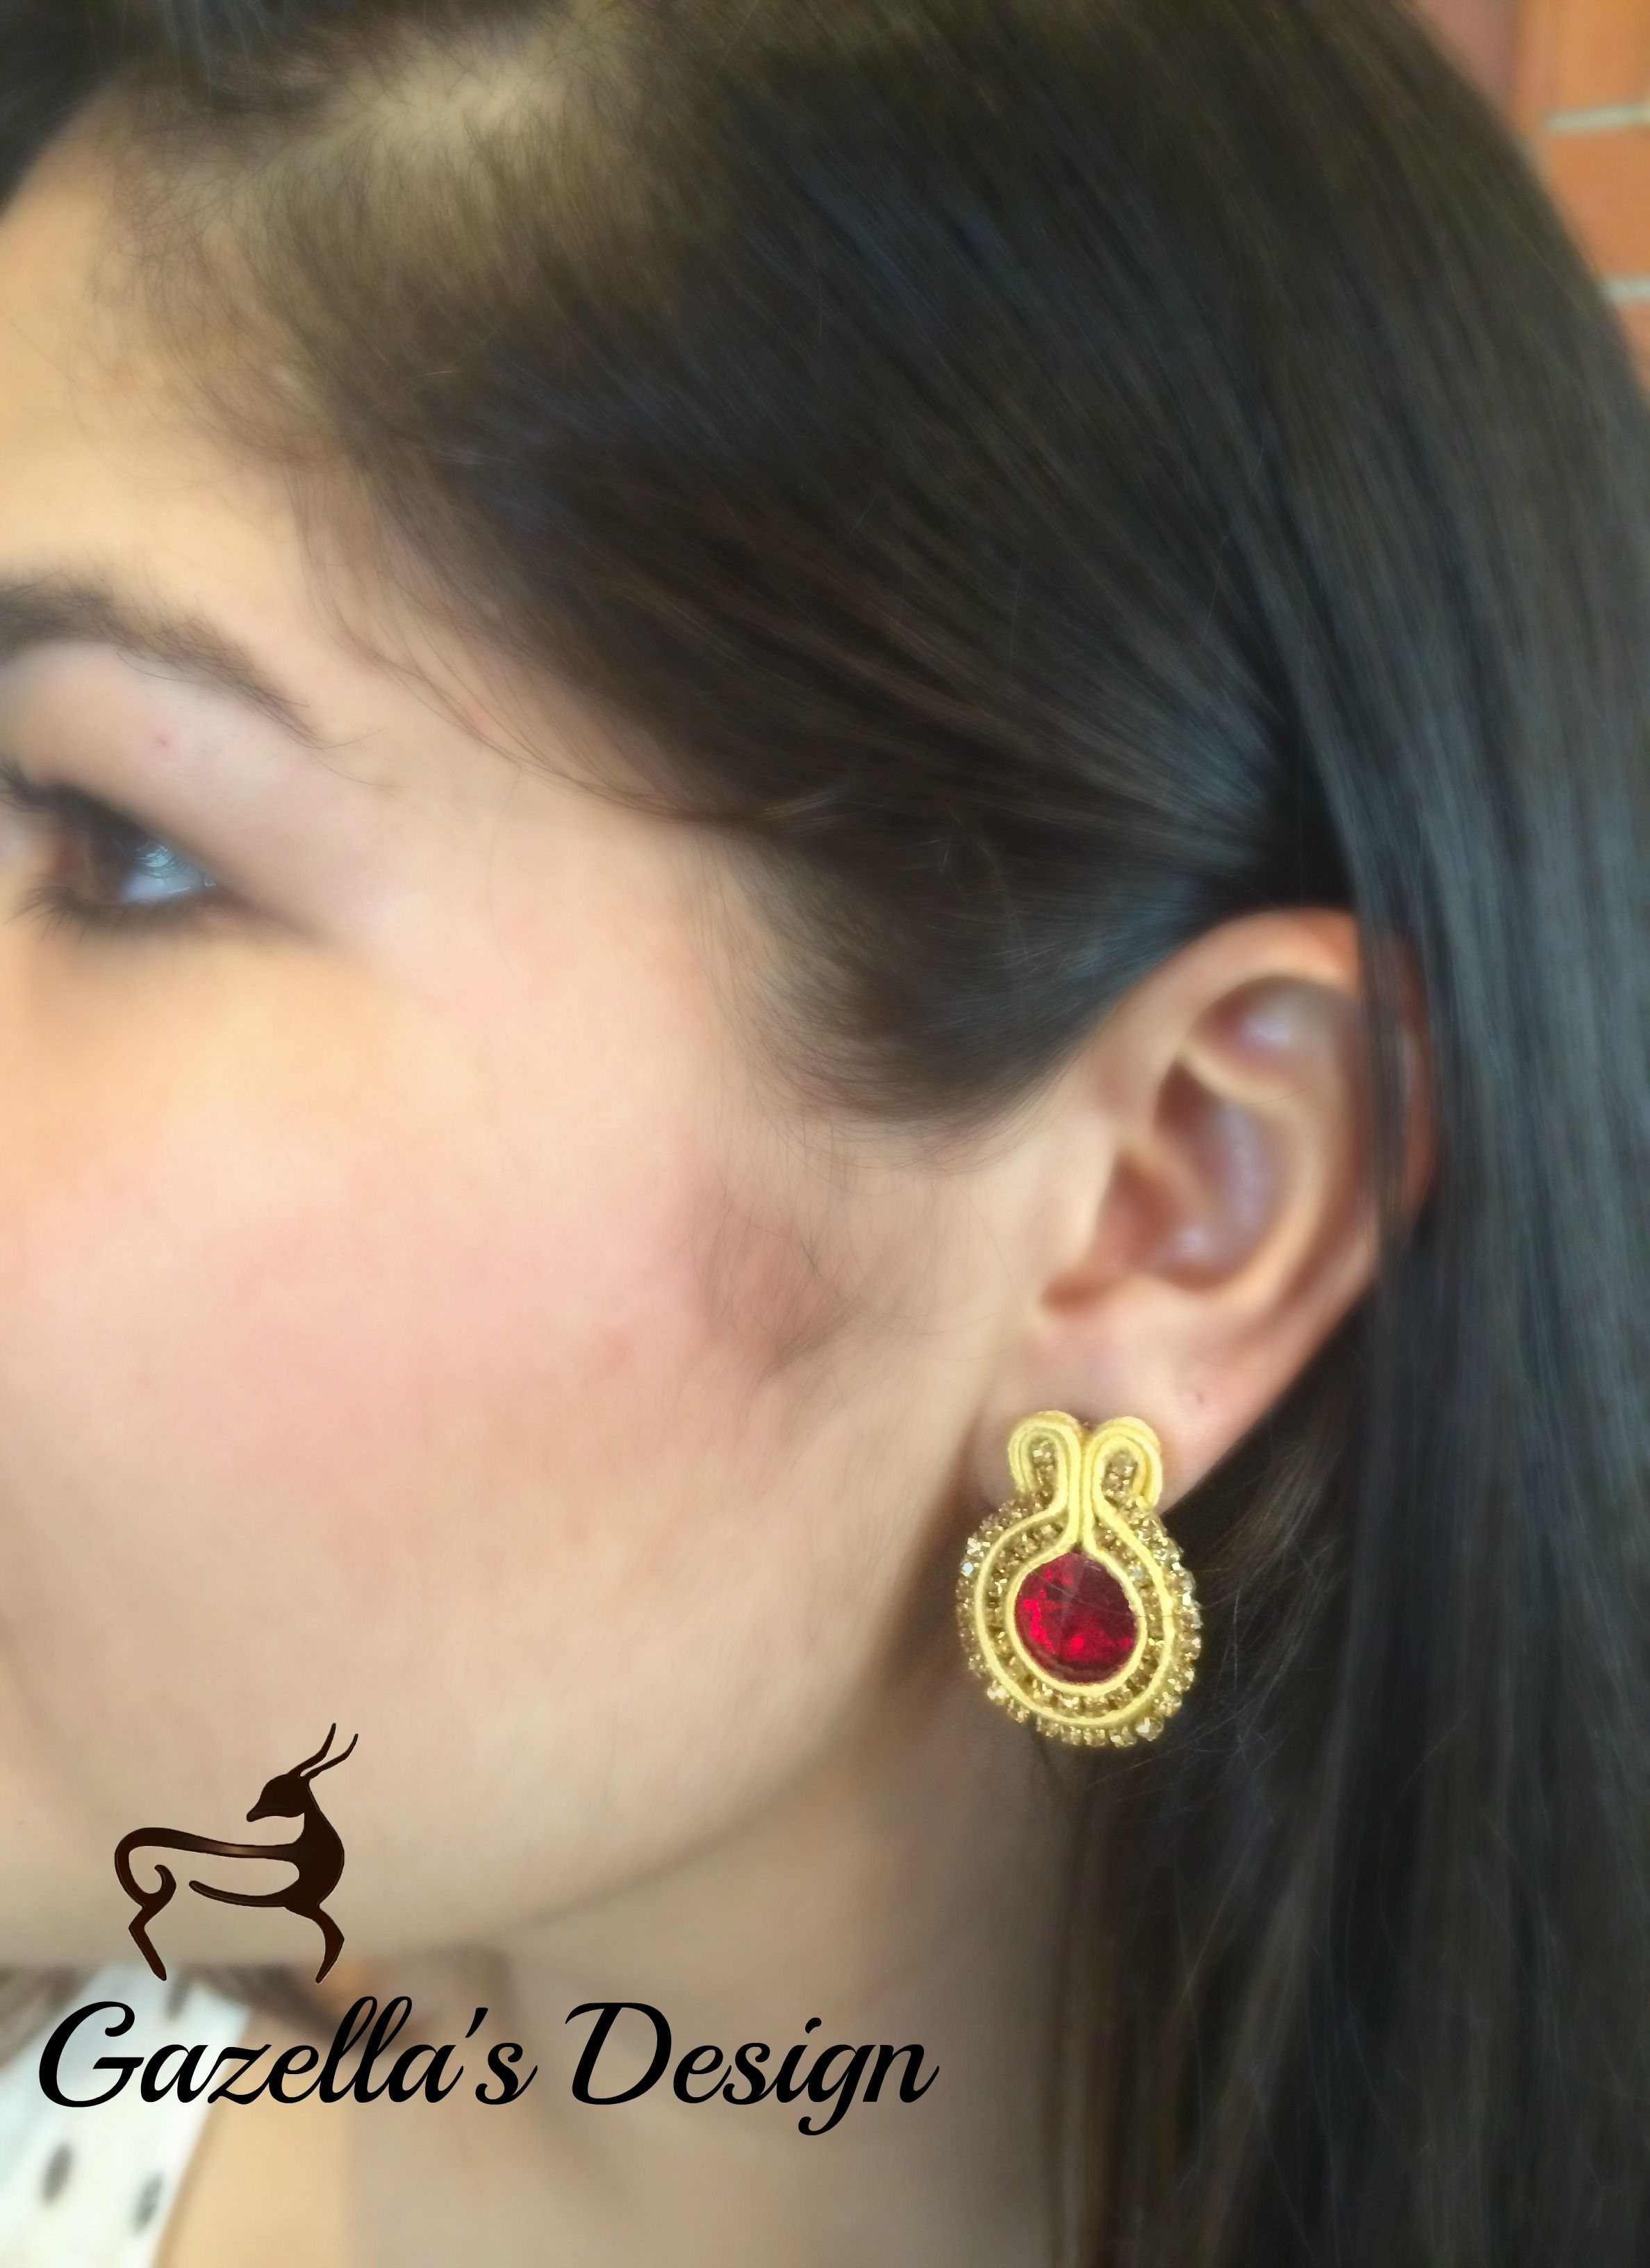 Red Glam.... Purchase info gazellasdesign@gmail.com or or visit www.poshmark.com/closet/gazellasdesign #soutache #earrings #elegantearrings #elegance #fashionpolis #texasfashion #madeforyou #handmade #handmadeset #accesoriesshop #custommade #jewelry #texas #houstongram #getyours #trendingnow #jewelryset #onlineshopping #onlinestore #shophouston @gazellasdesign